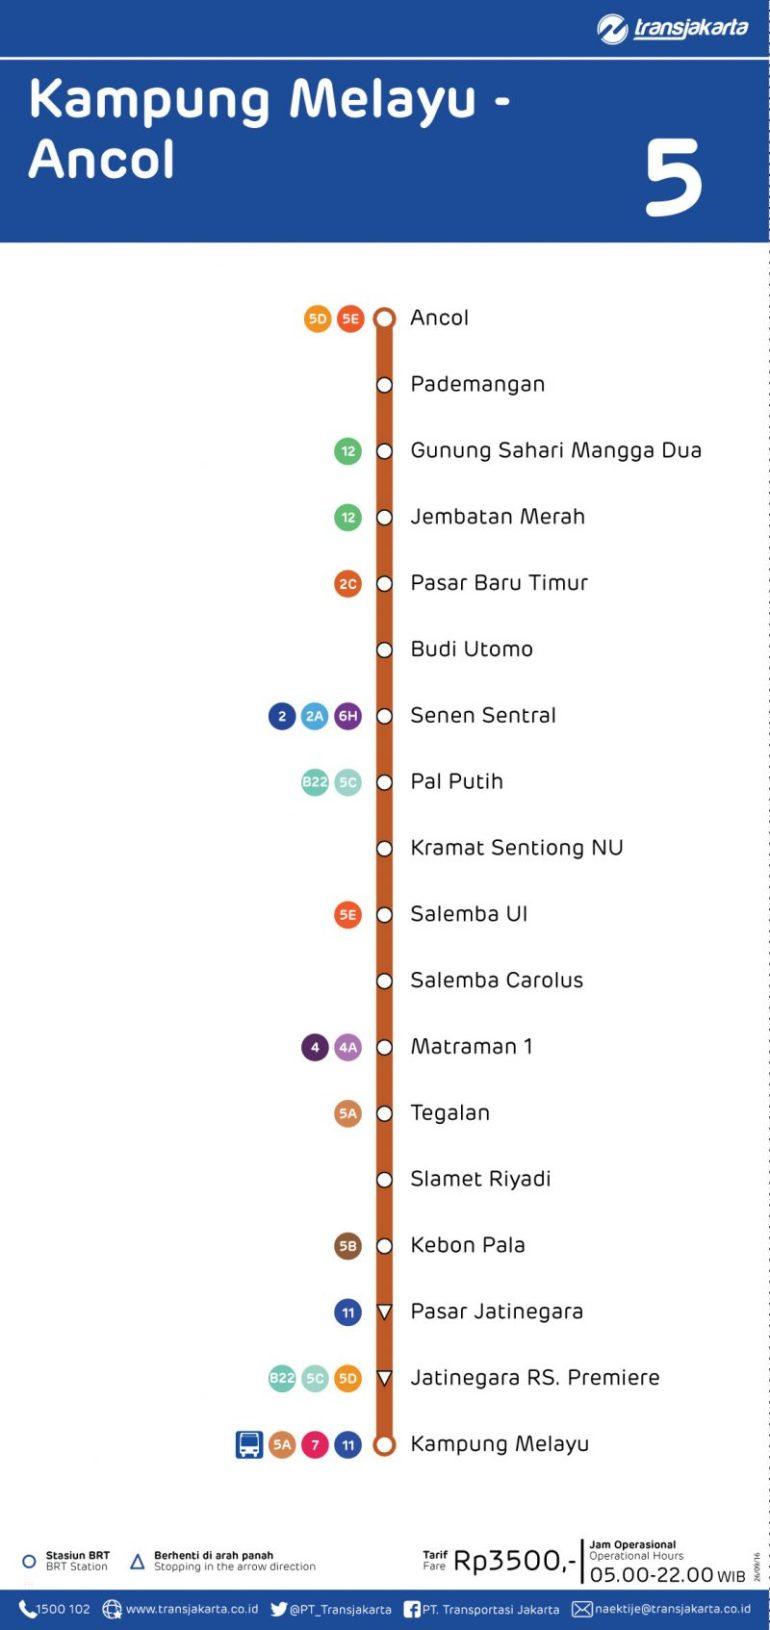 Koridor 5 Kampung Melayu - Ancol